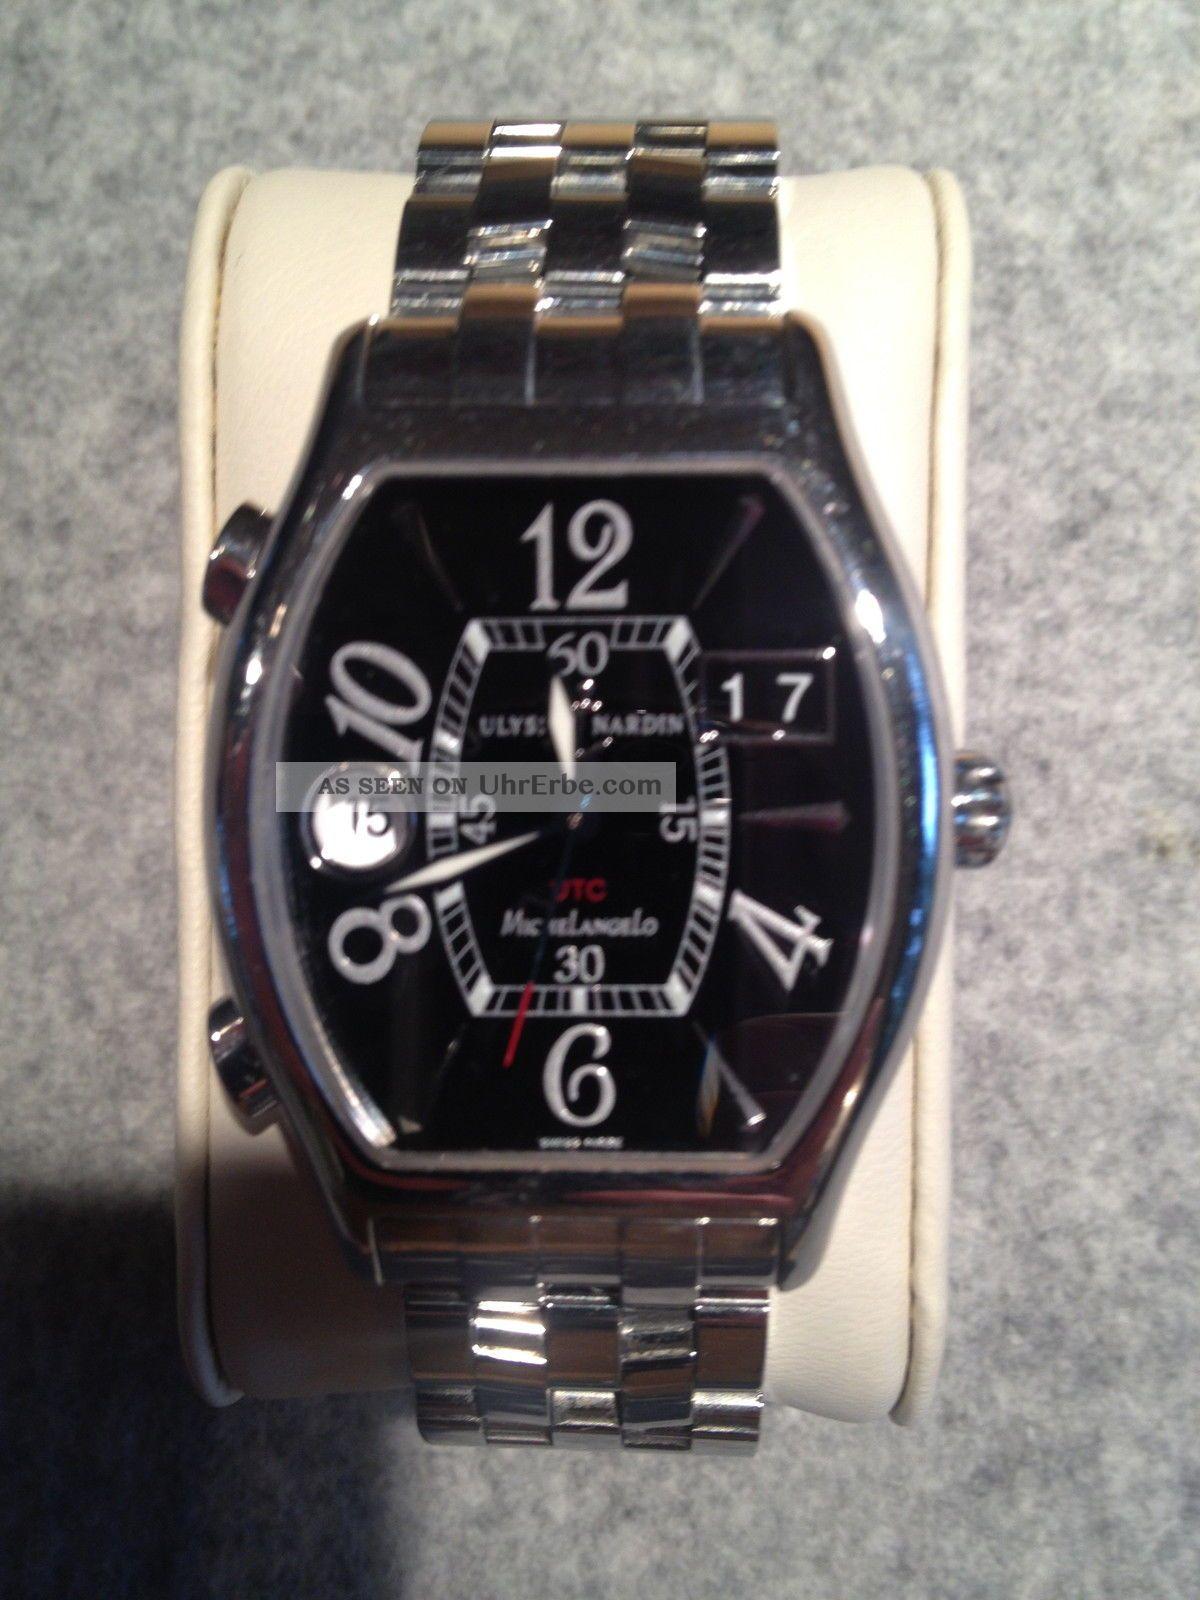 Ulysse Nardin Michelangelo Gigante Chronometer 43x38 Mm Uvp 5.  360,  - Armbanduhren Bild